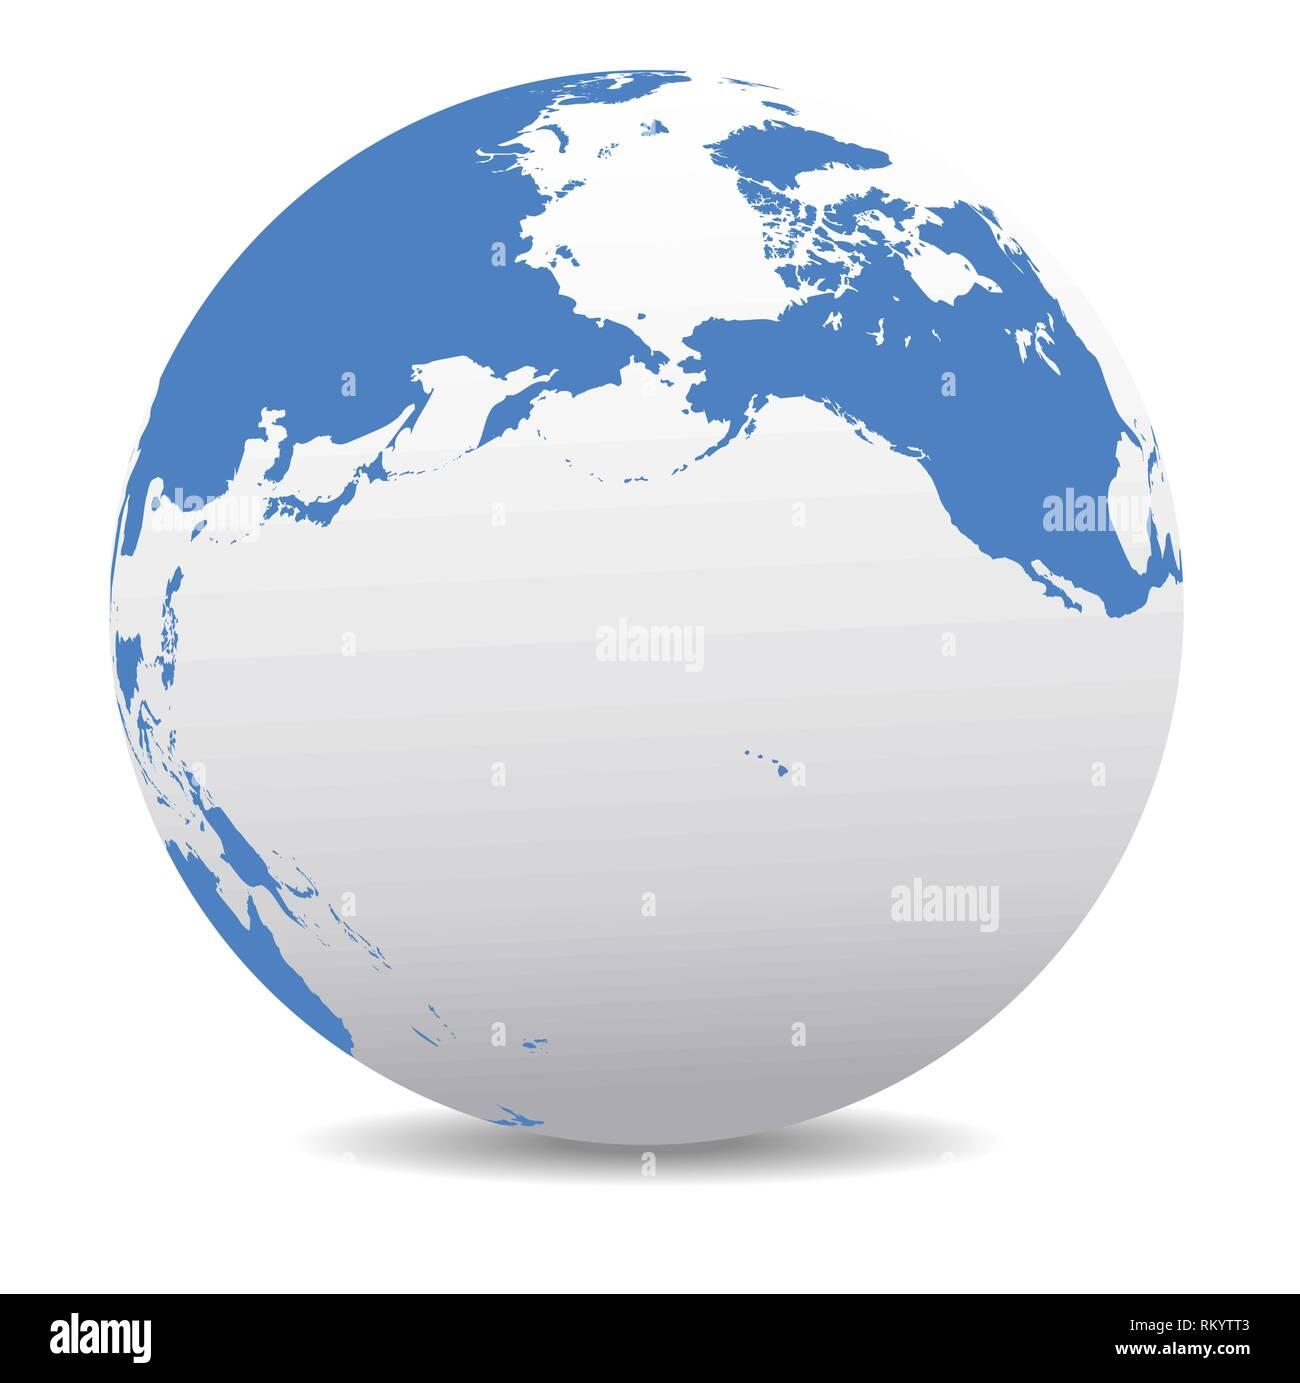 Pacific Rim North America, Canada, Siberia Russia and Hawaii Global World, Vector Map Icon of the World Globe - Stock Vector